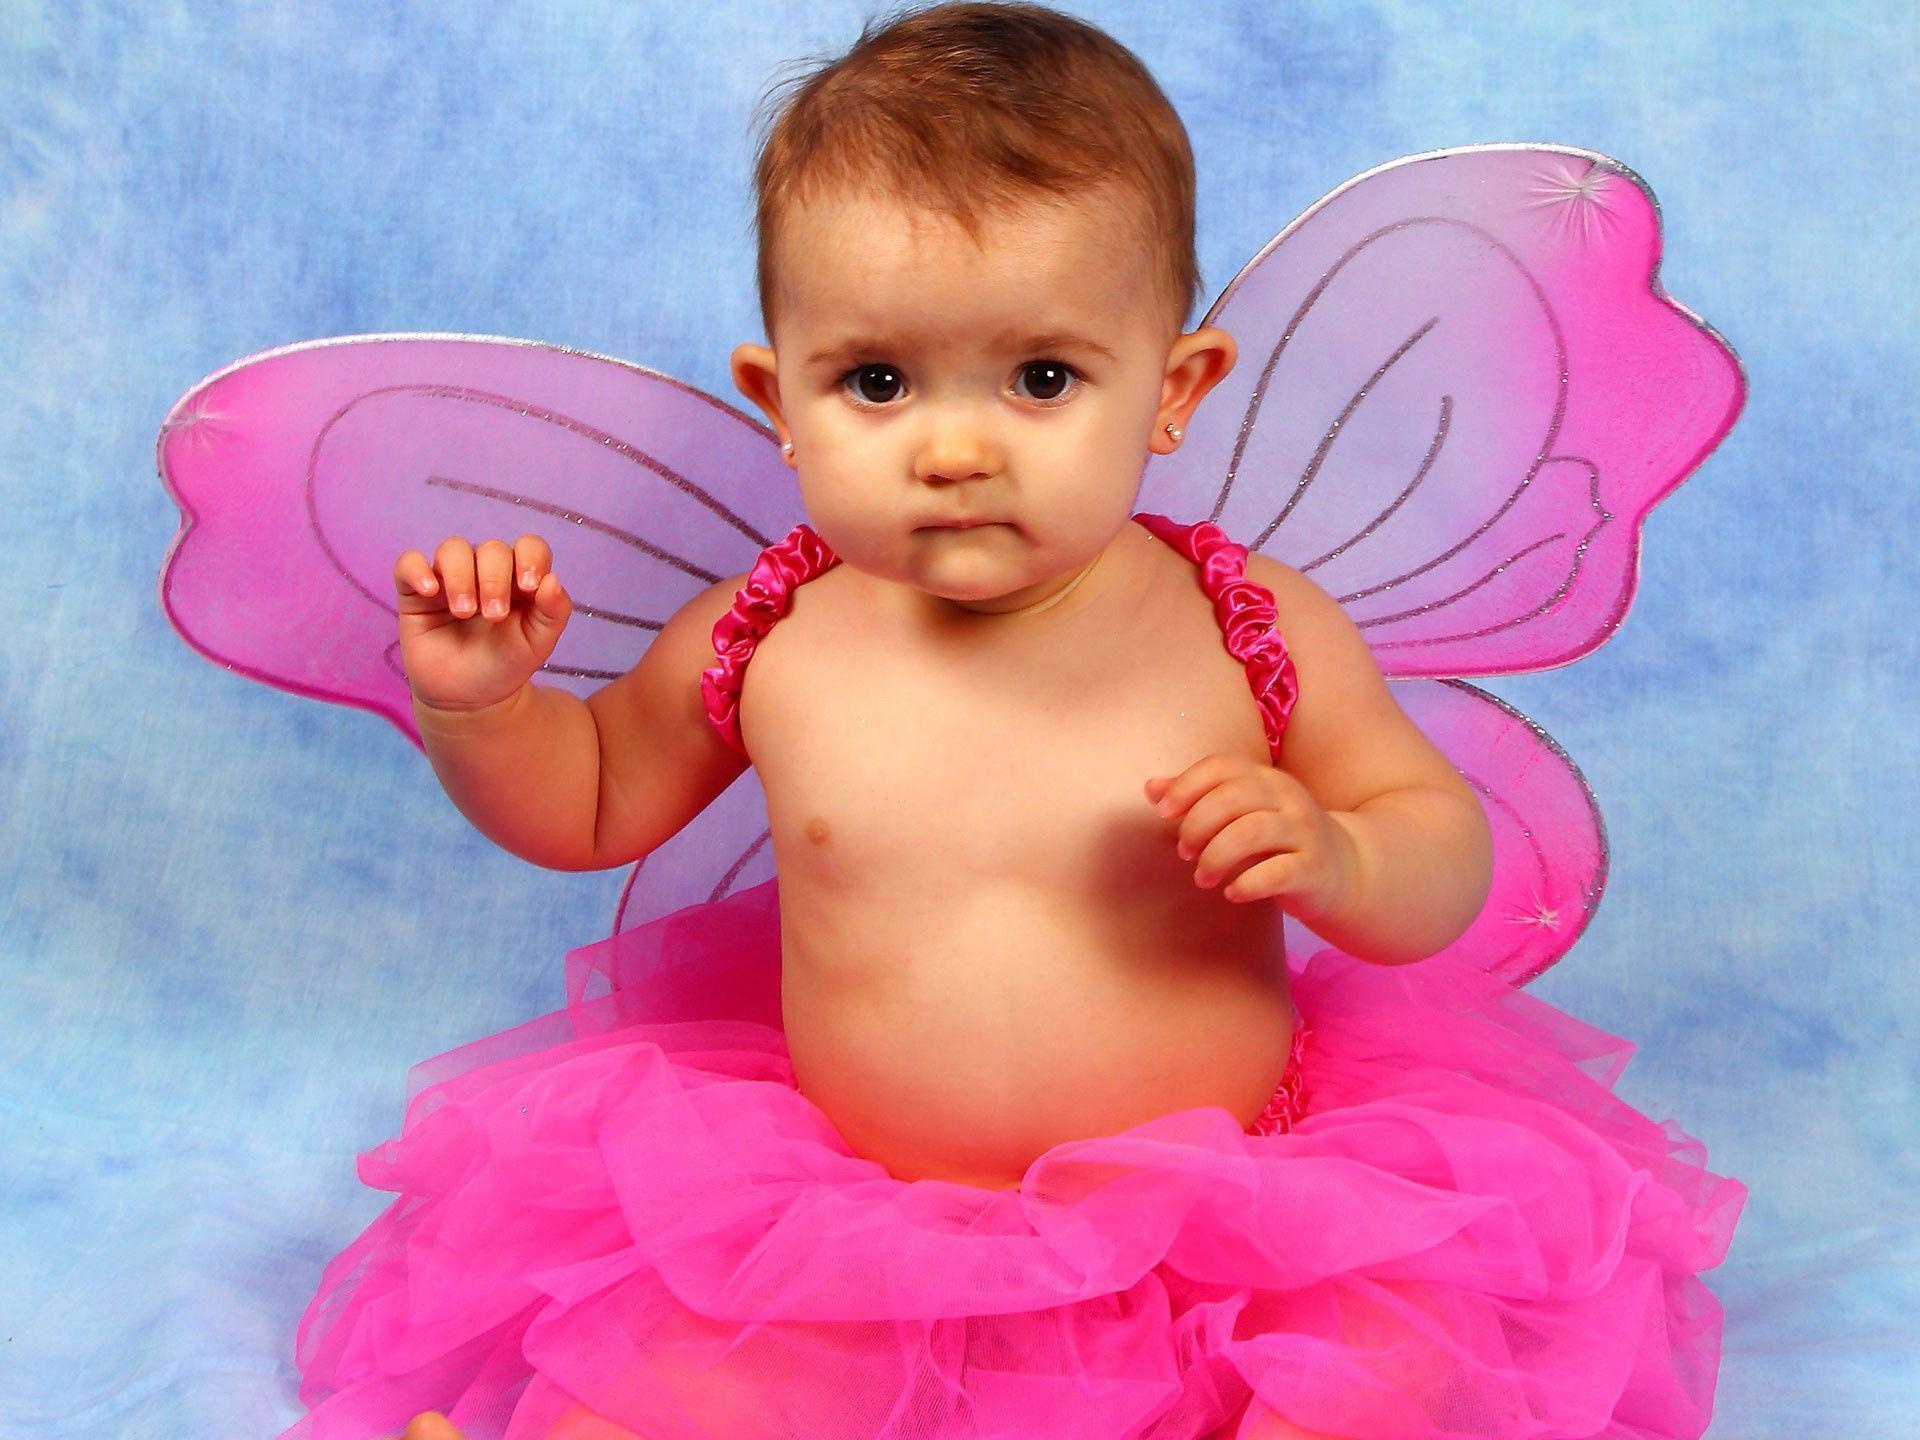 Beautiful Babies Wallpapers: Beautiful Babies Wallpapers